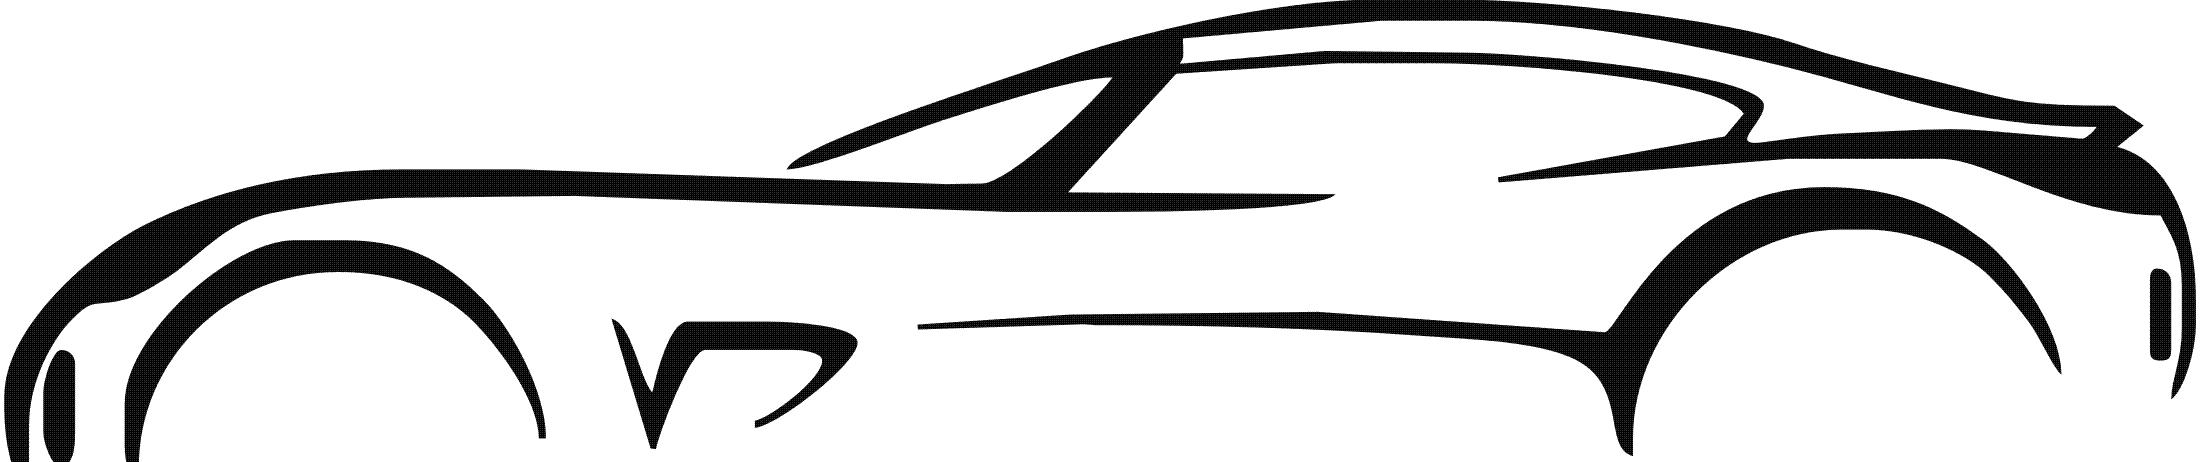 13 sports car outline vector images   car outline vector